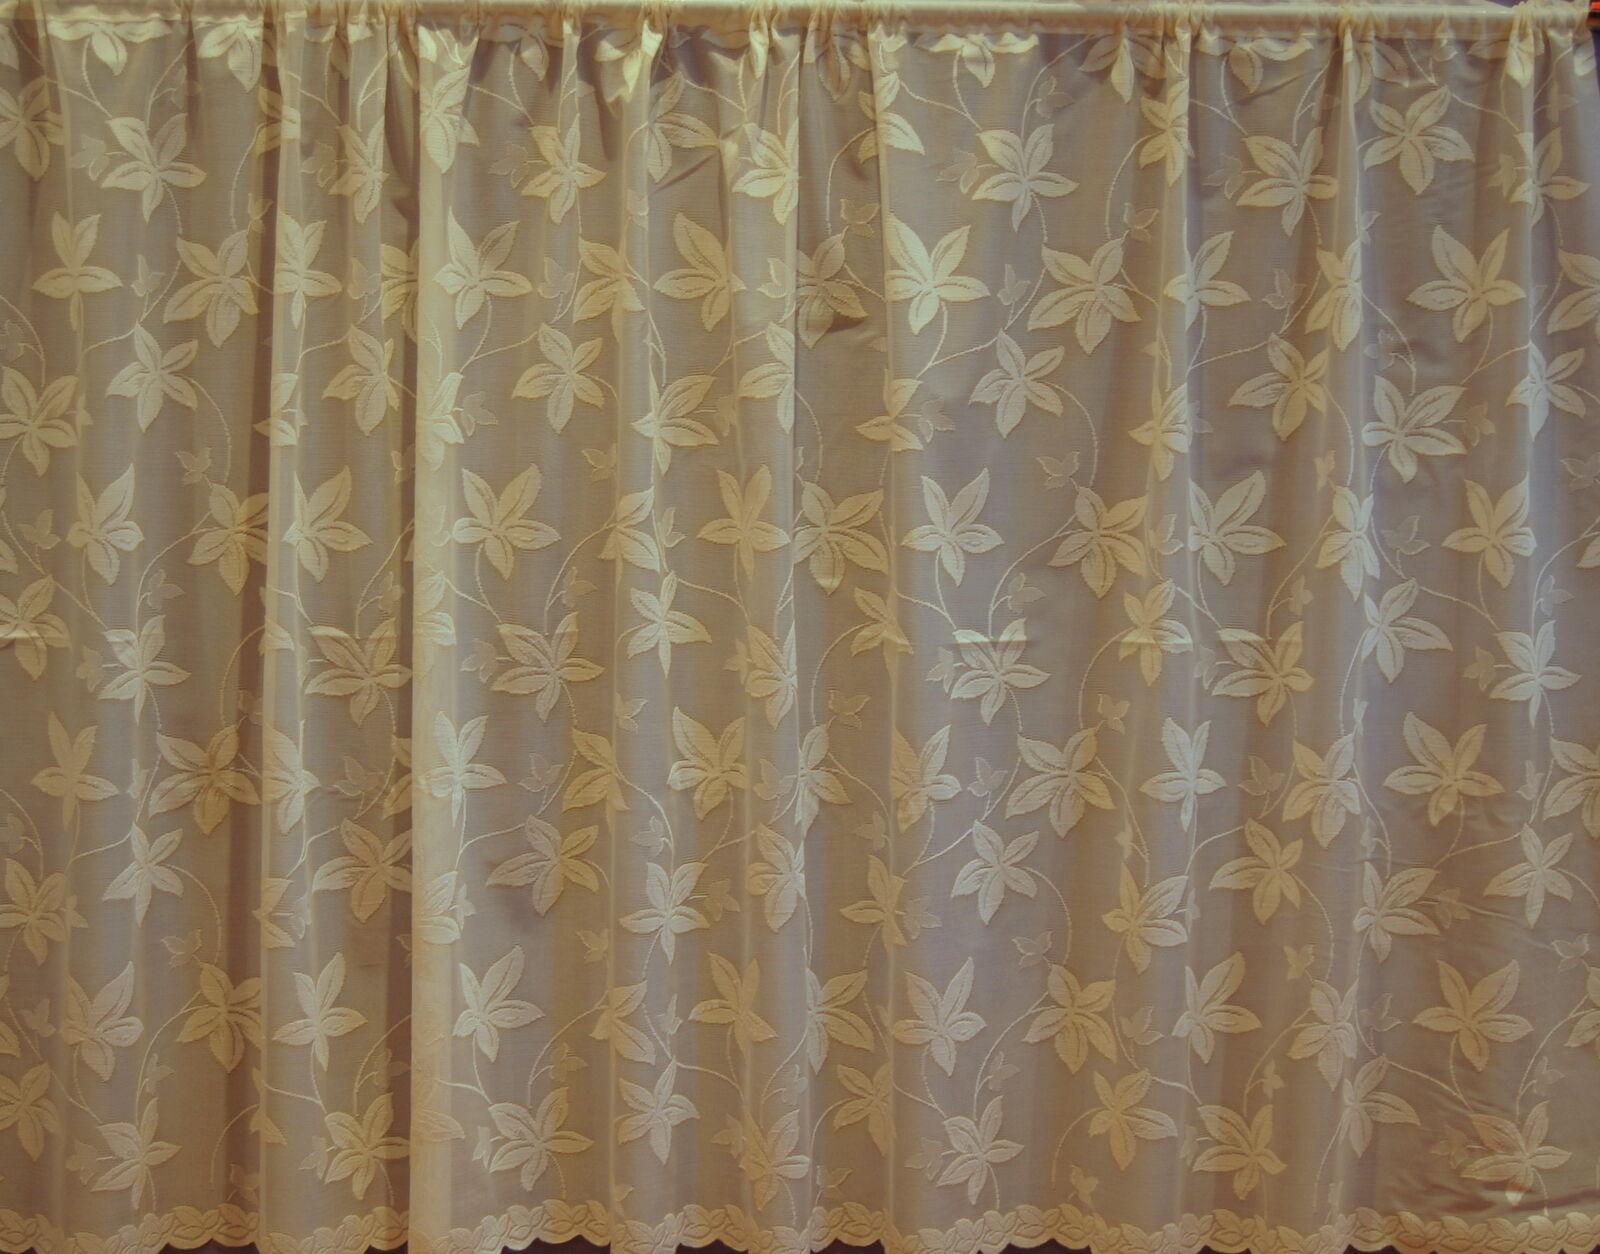 Curtains & Pelmets Curtains & Blinds Home Furniture & DIY